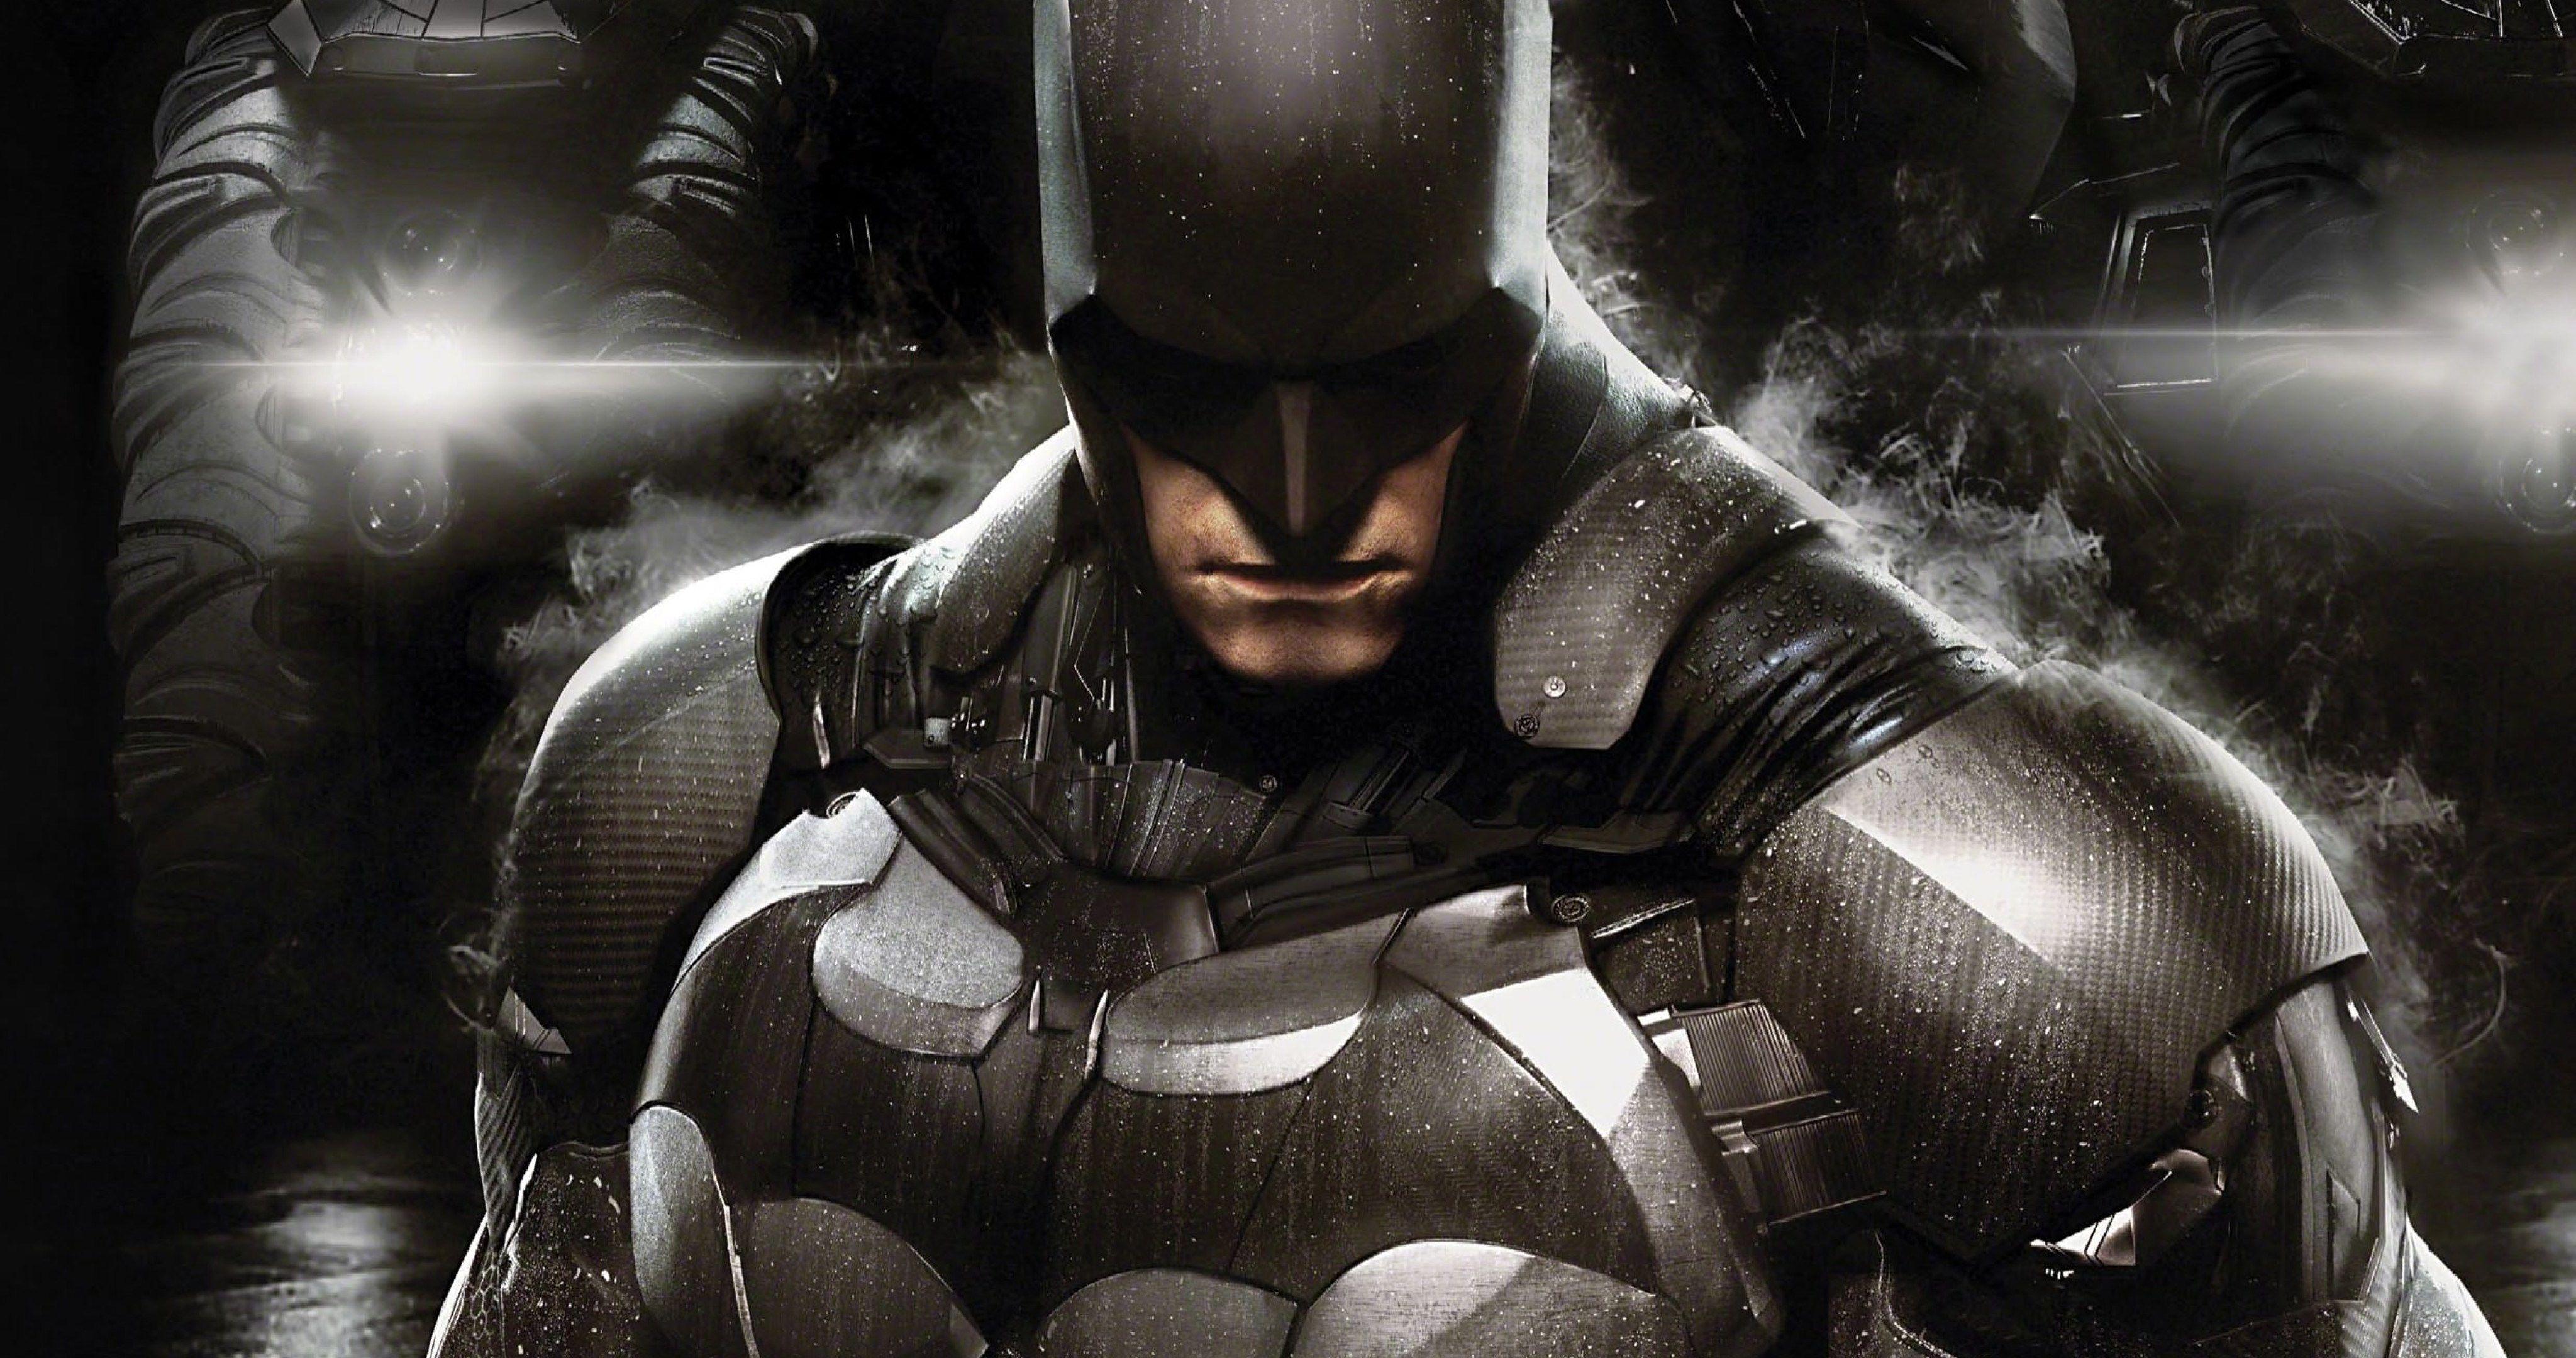 Batman Arkham Knight Bruce Wayne 4k Ultra Hd Wallpaper Batman Batman Arkham Batman Vs Superman